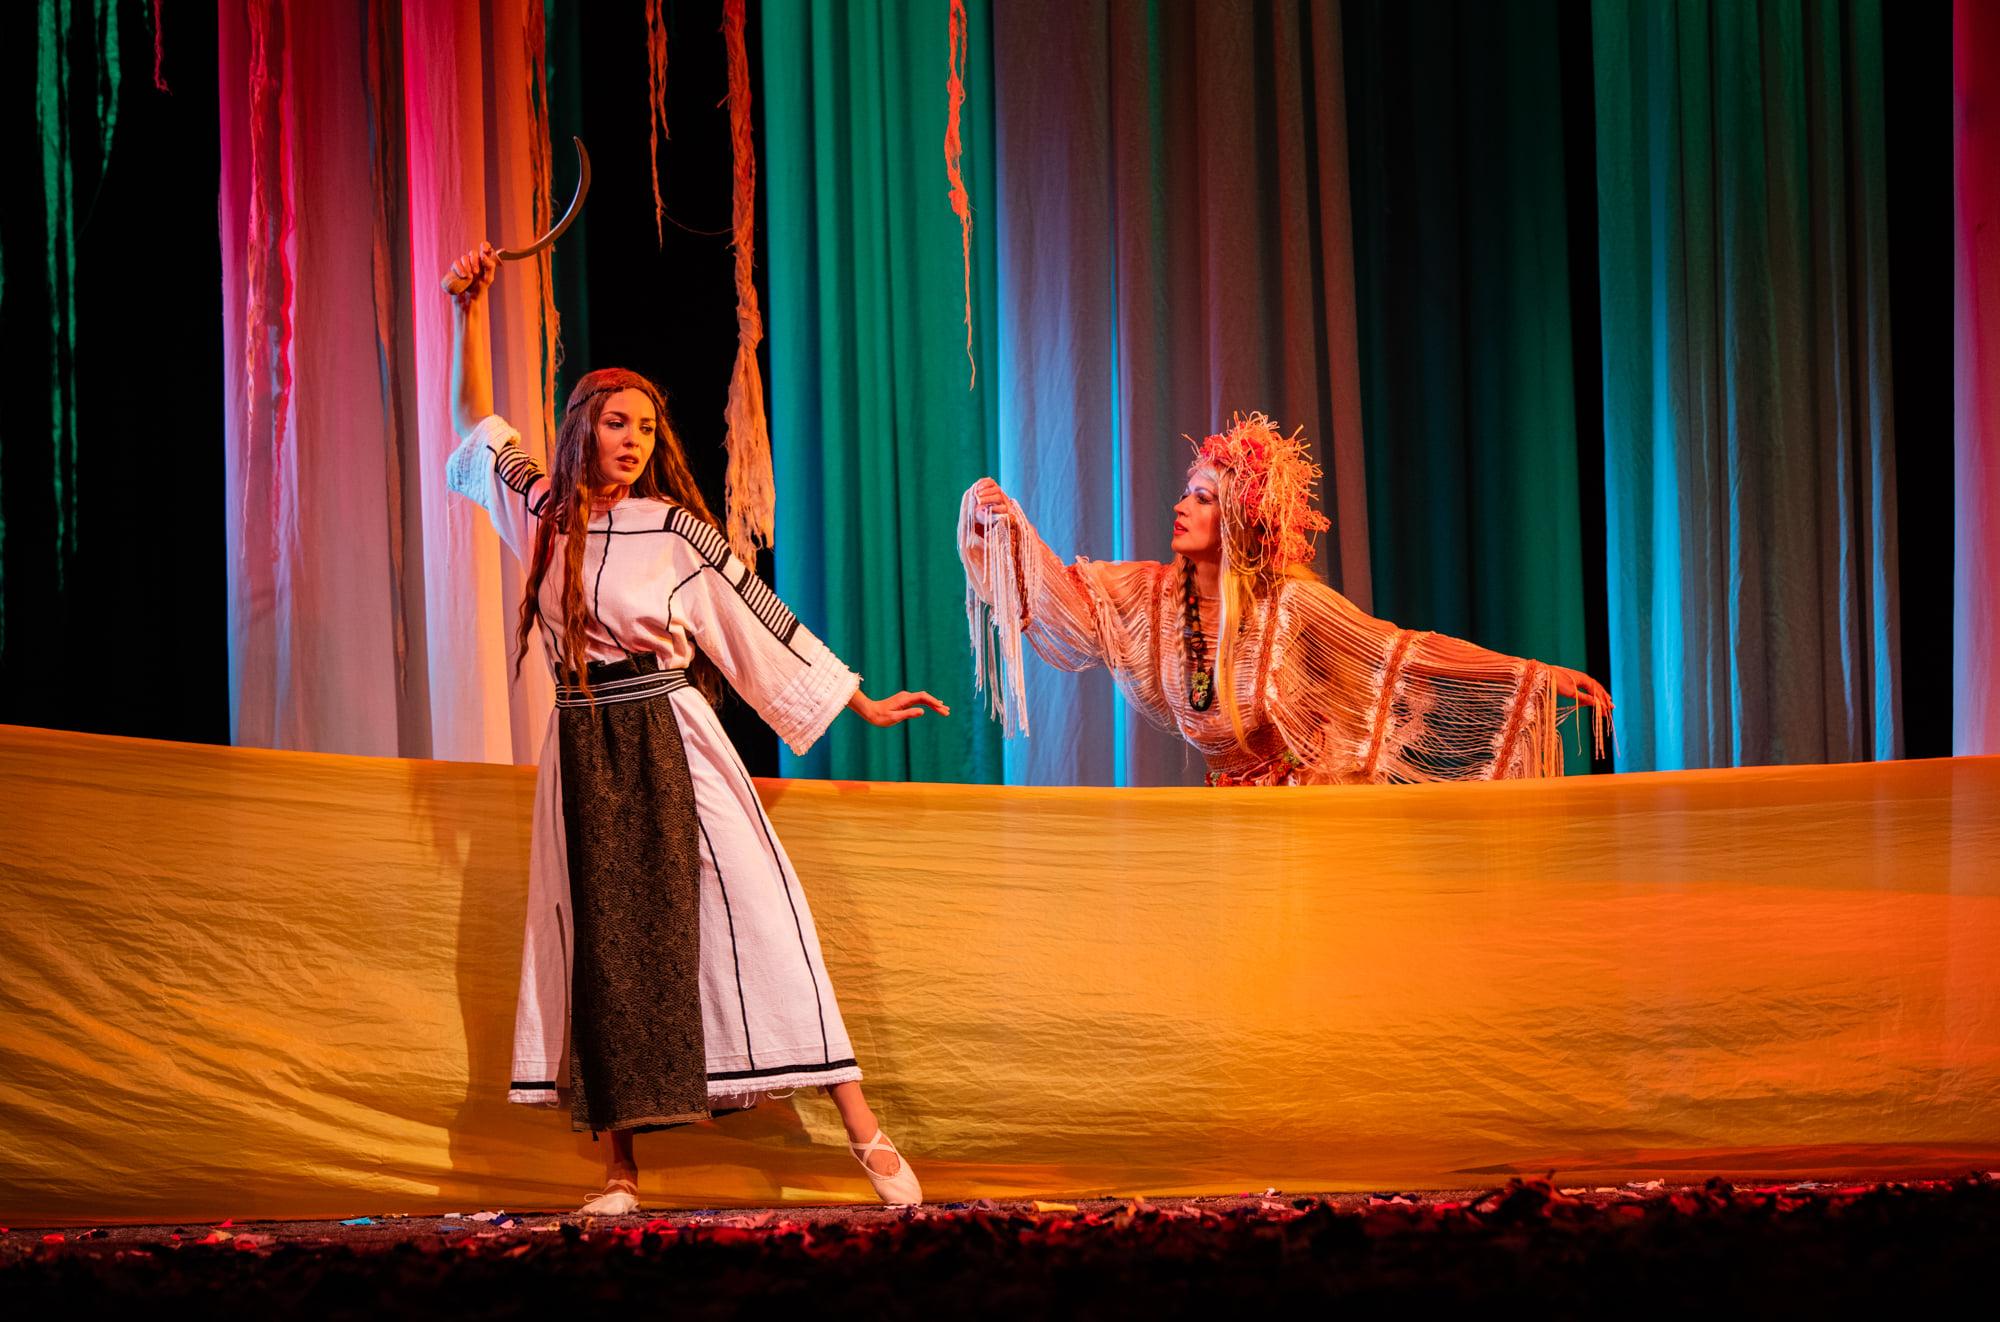 Как сегодня в Днепре отметят 150-летие со дня рождения Леси Украинки